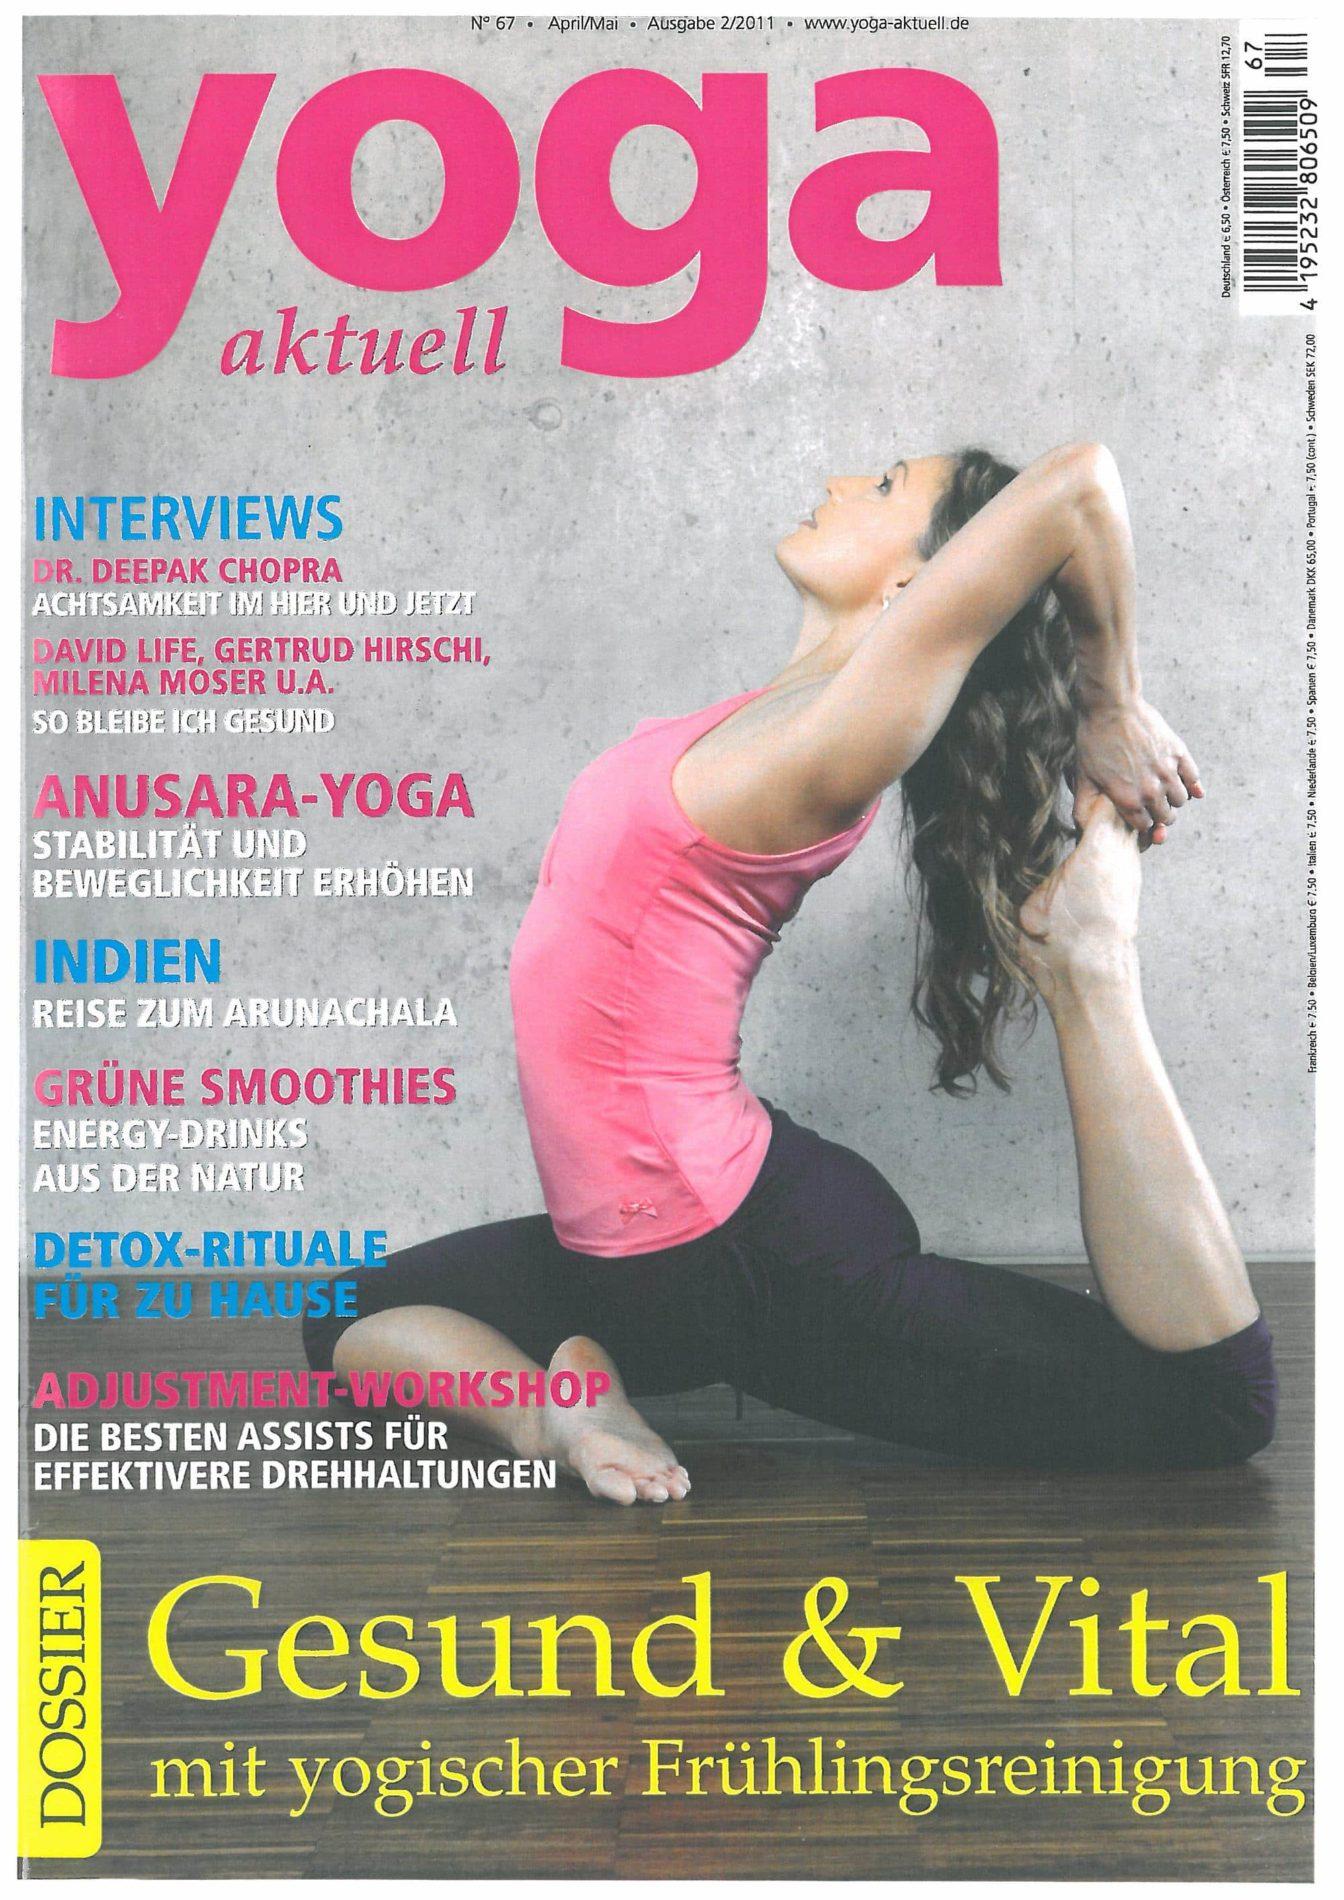 Yoga aktuell  – kurz gefragt